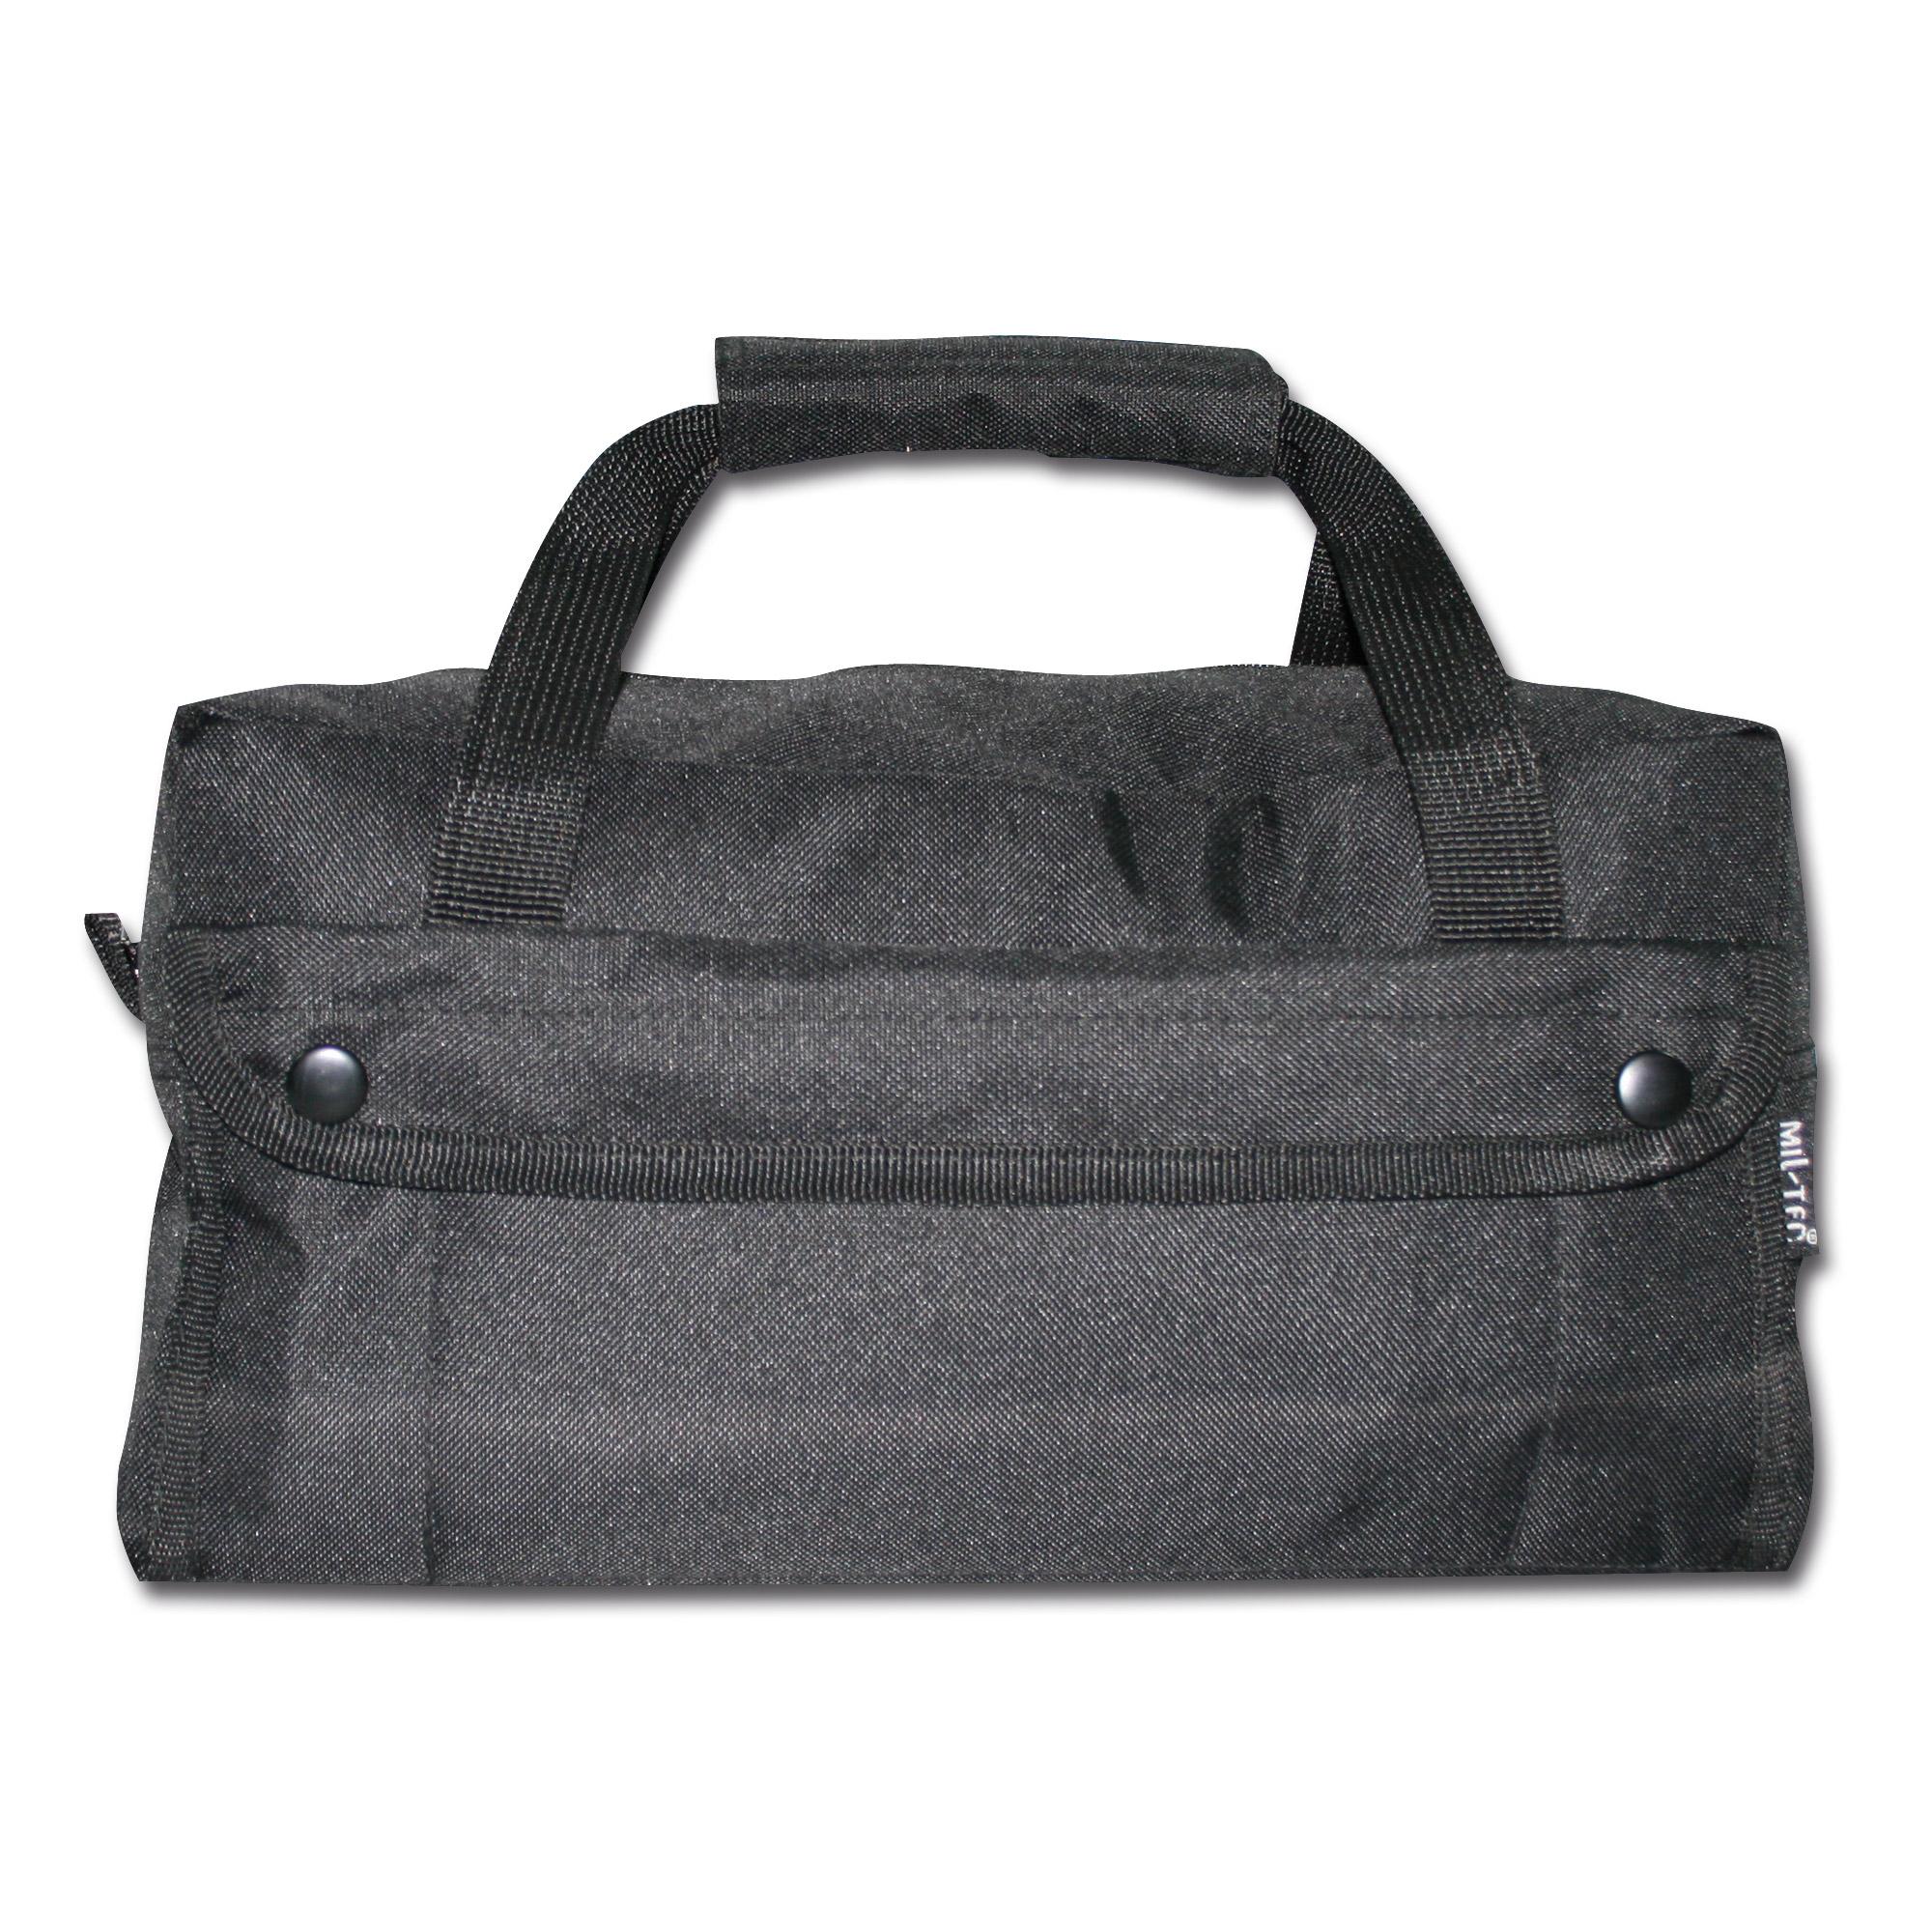 Mil-Tec Bag Small black